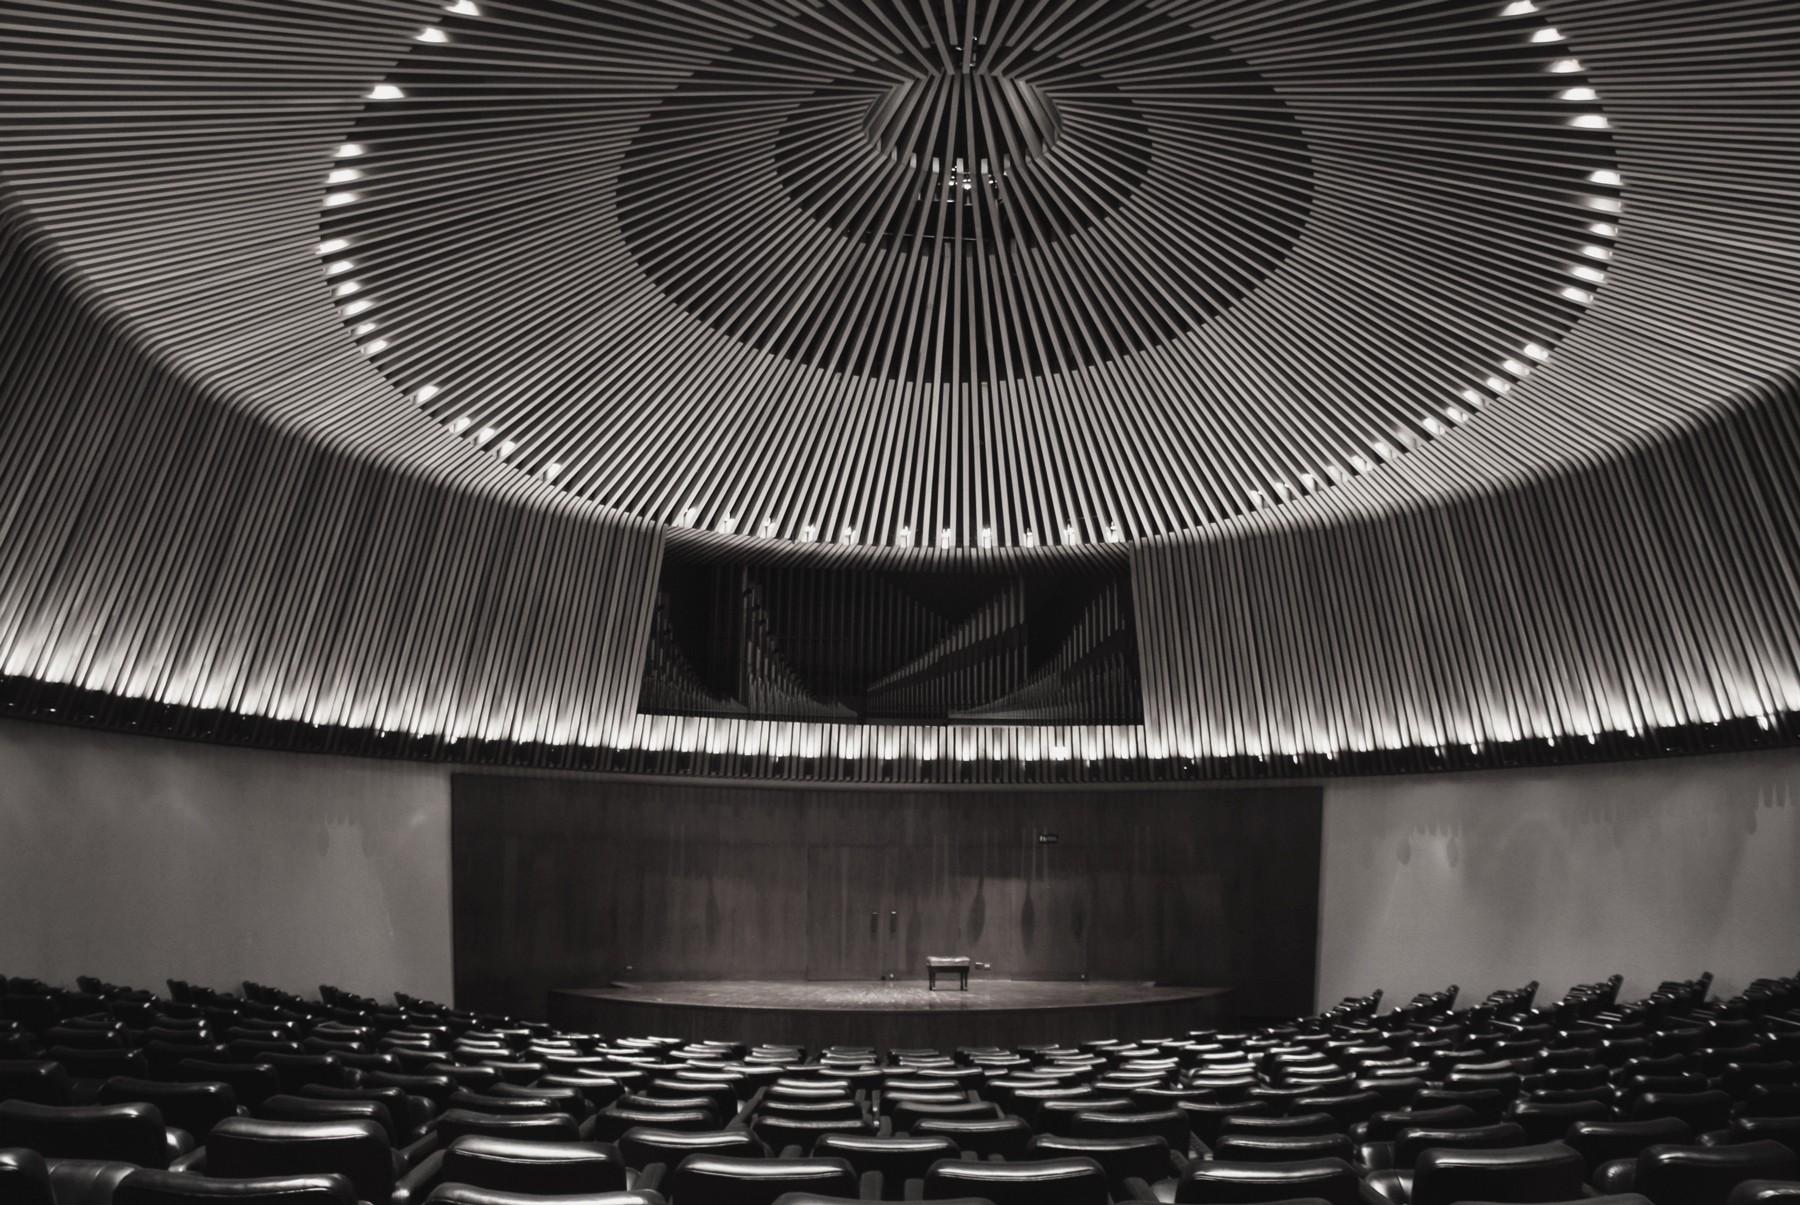 Clásicos de Arquitectura: Biblioteca Luis Angel Arango / Germán Samper, © Dan Gamboa Bohorquez